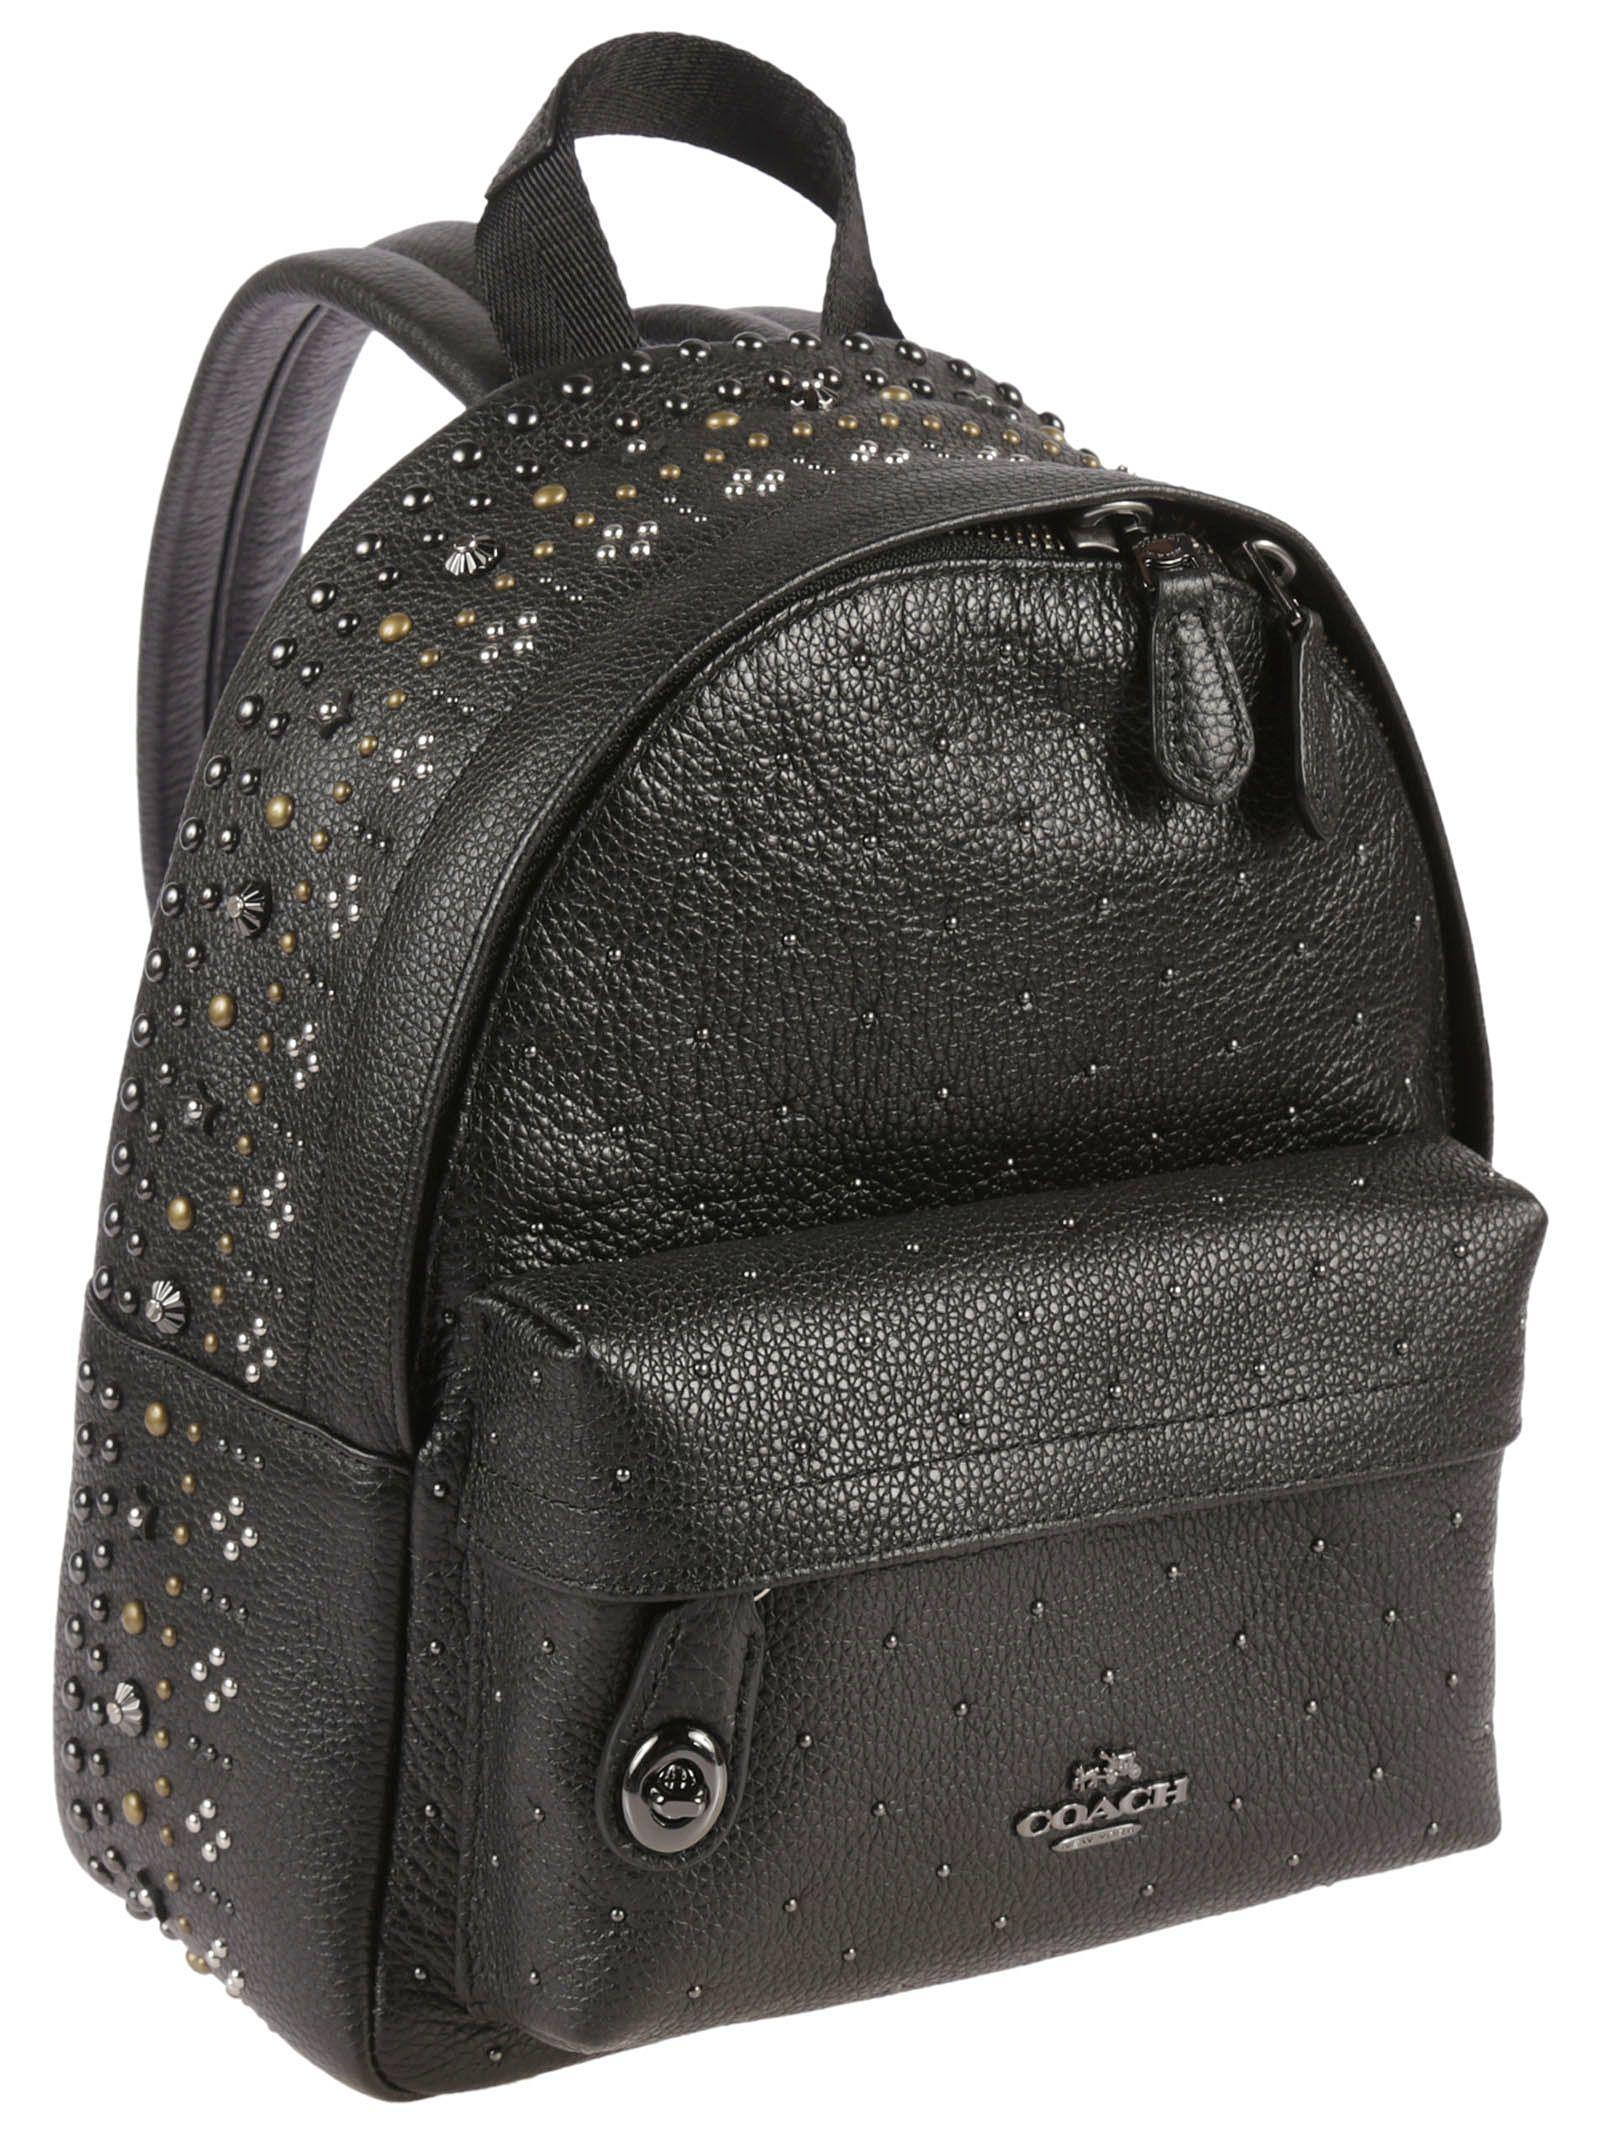 6ba8d5f319d2cc Black Gold Studded Backpack- Fenix Toulouse Handball